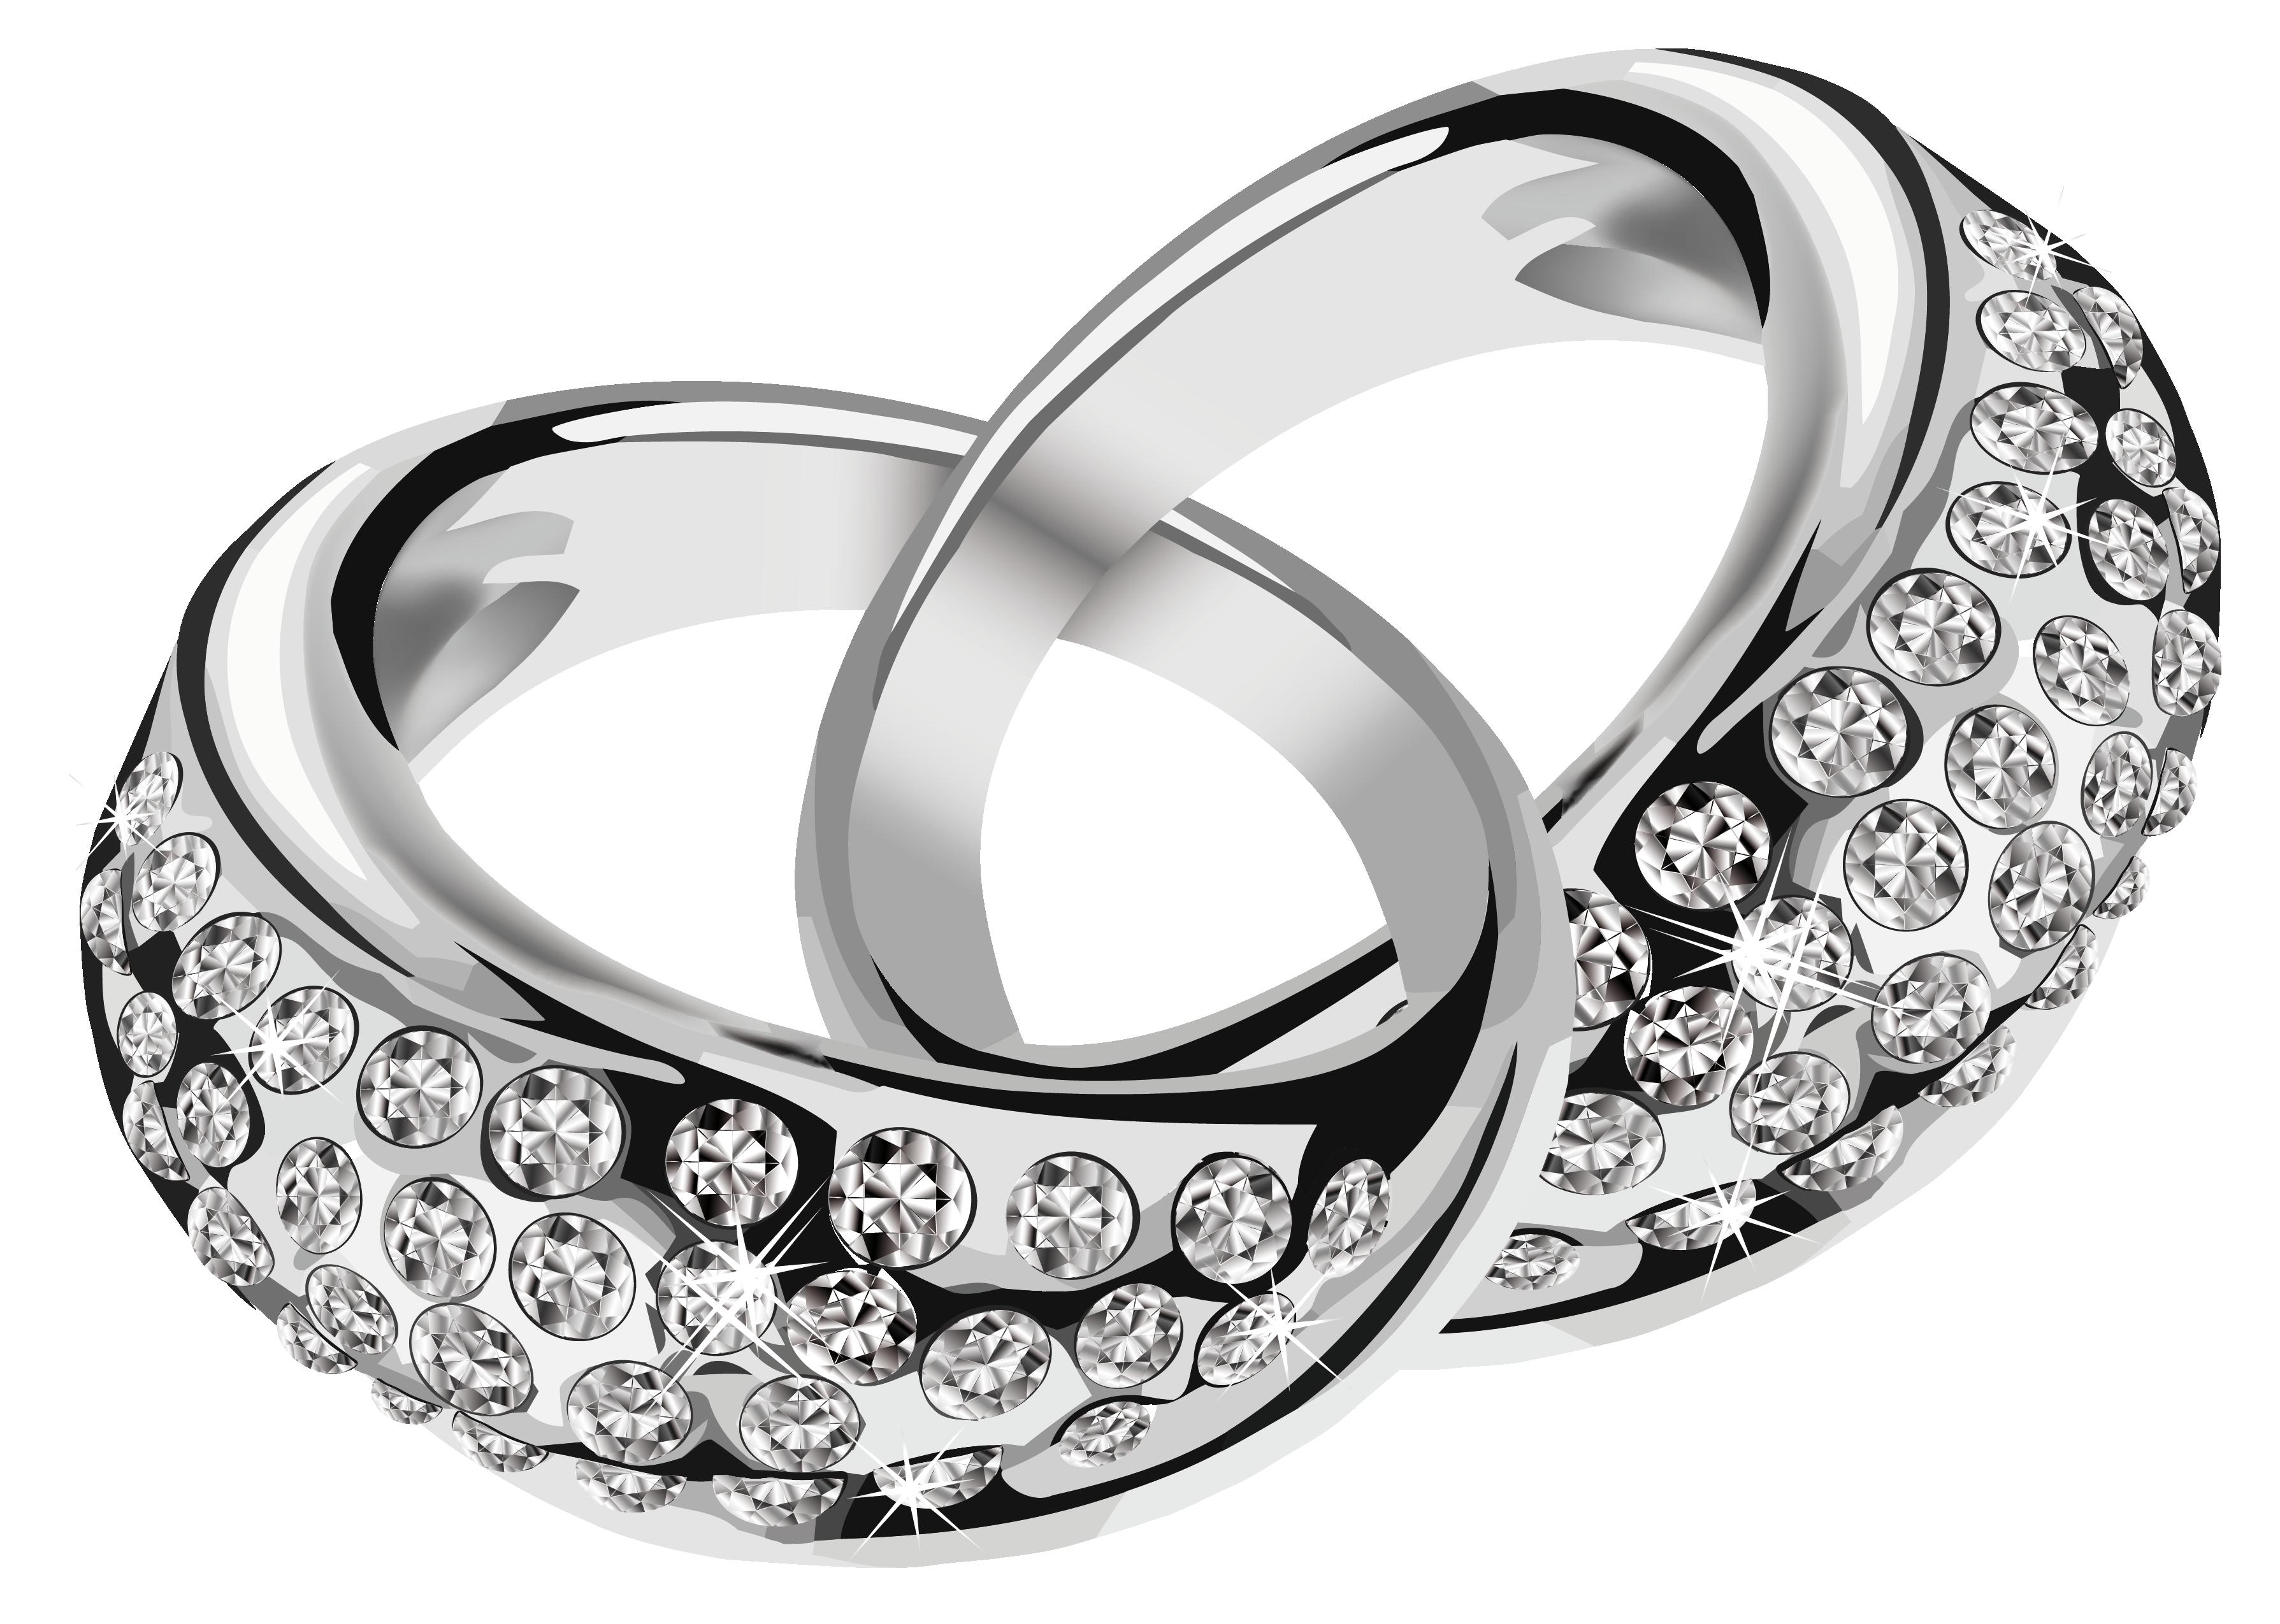 3578x2549 Free Jewelry Clip Art